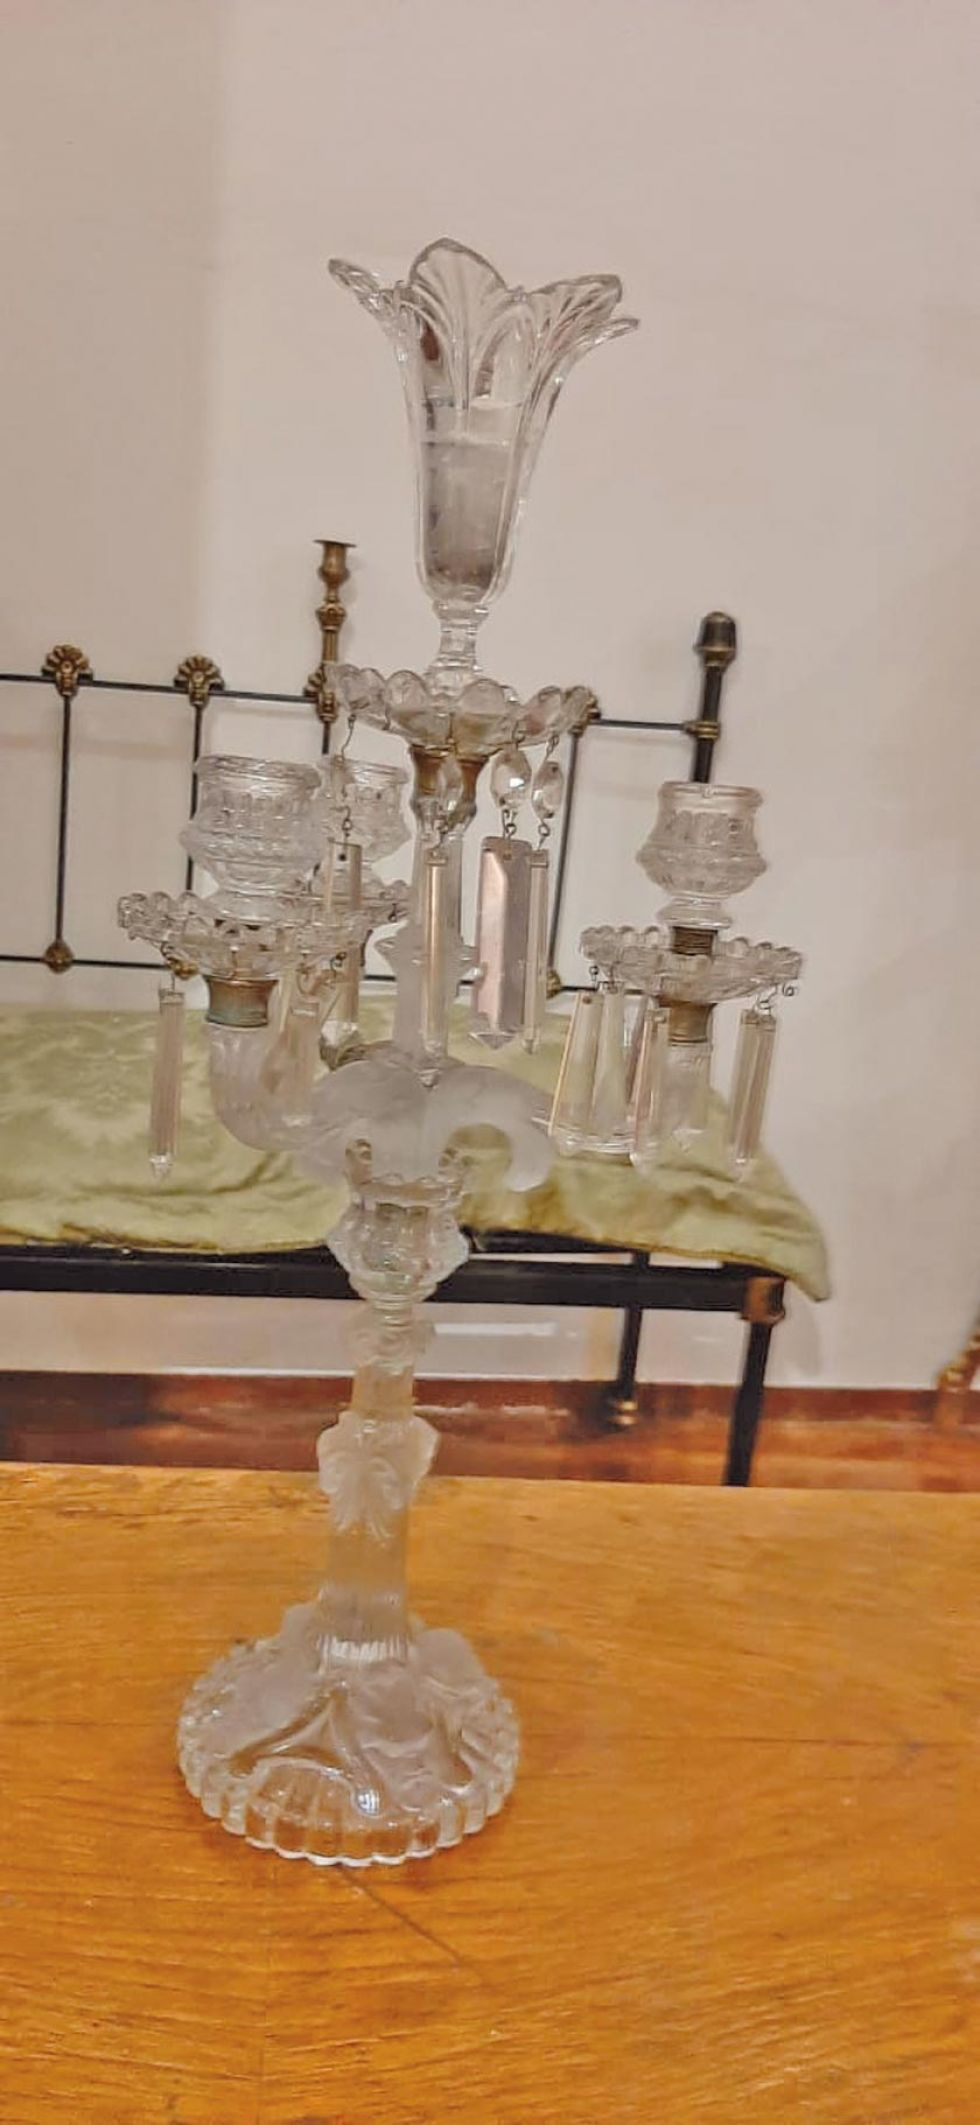 Un candelabro de cristal.